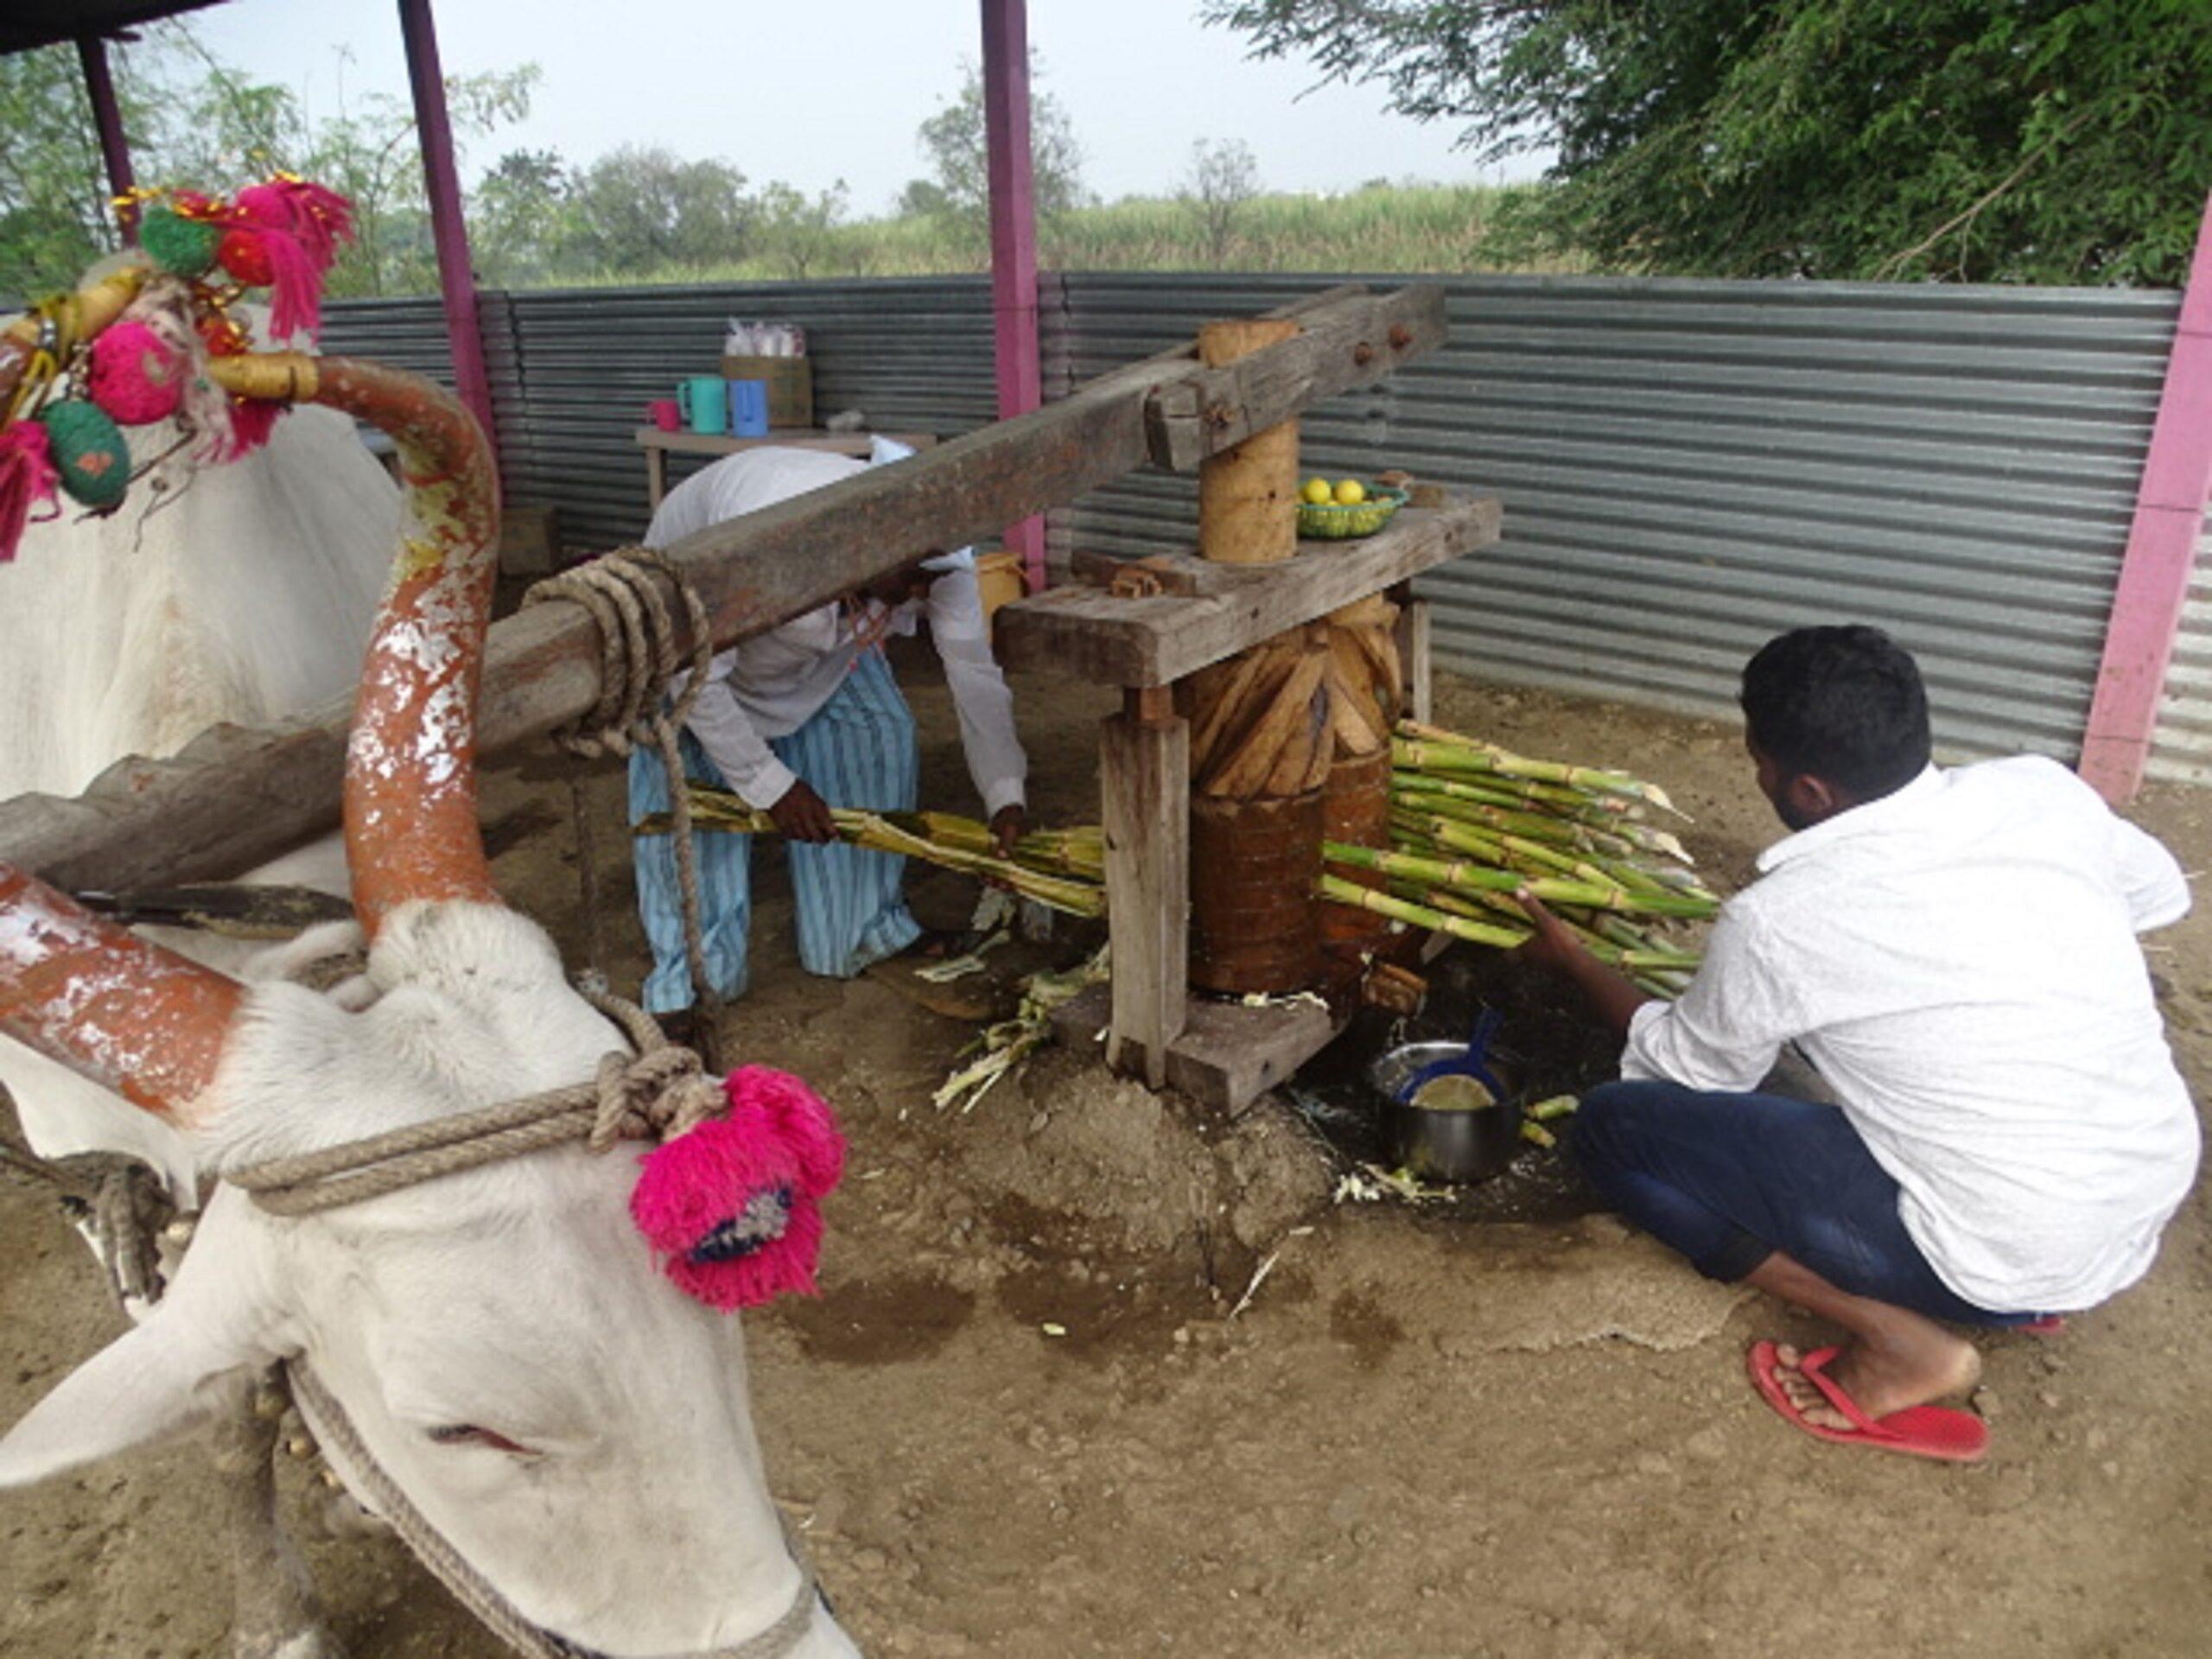 Kolhoo ka Bail for Sugarcane Juice at Umbre Village, Ahmednagar, Maharashtra, India